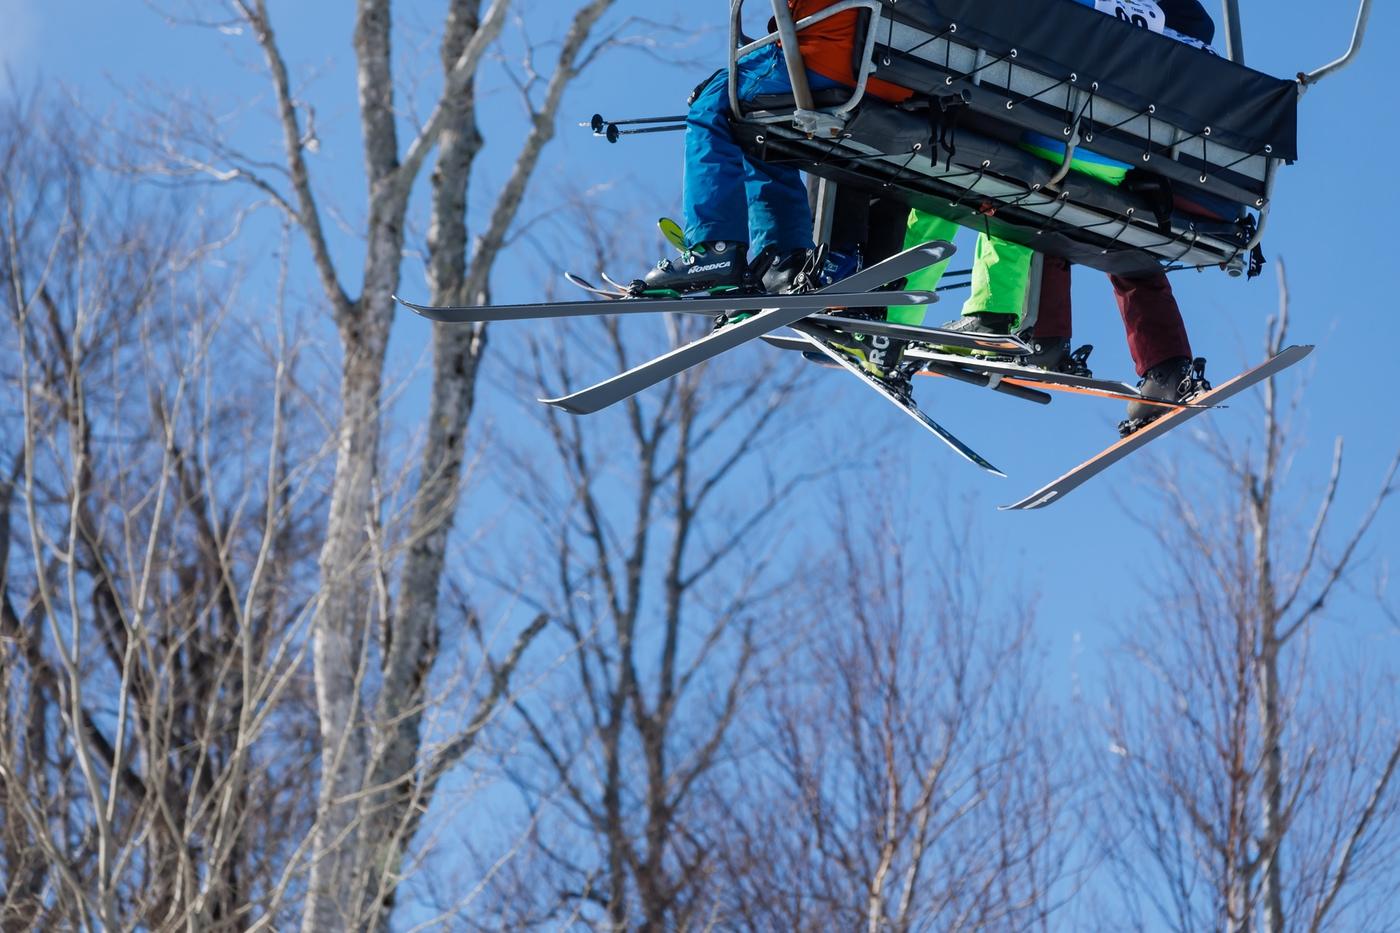 WinterKids Downhill 24 2021 SDP 3205